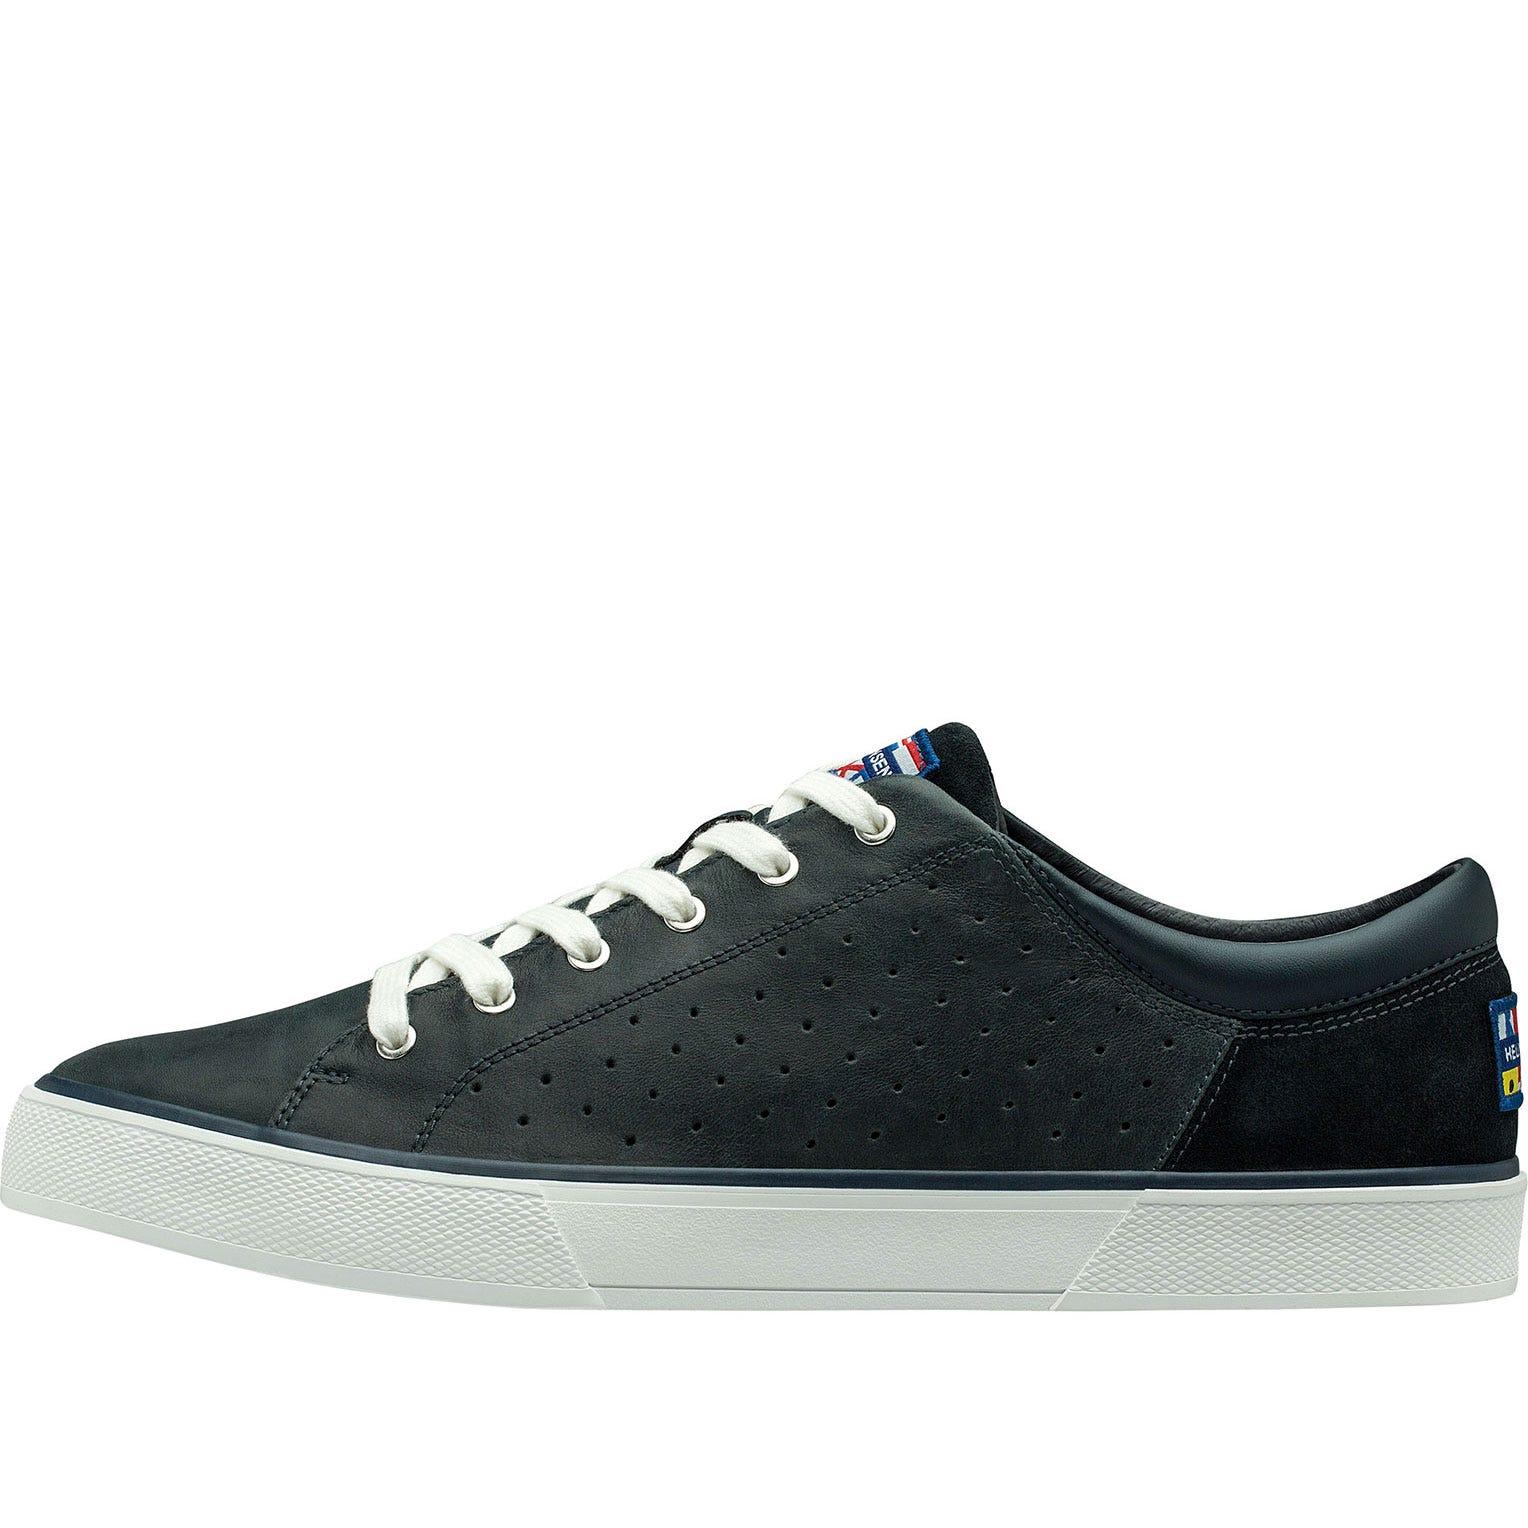 Helly Hansen Mens Casual Shoe Navy 7.5